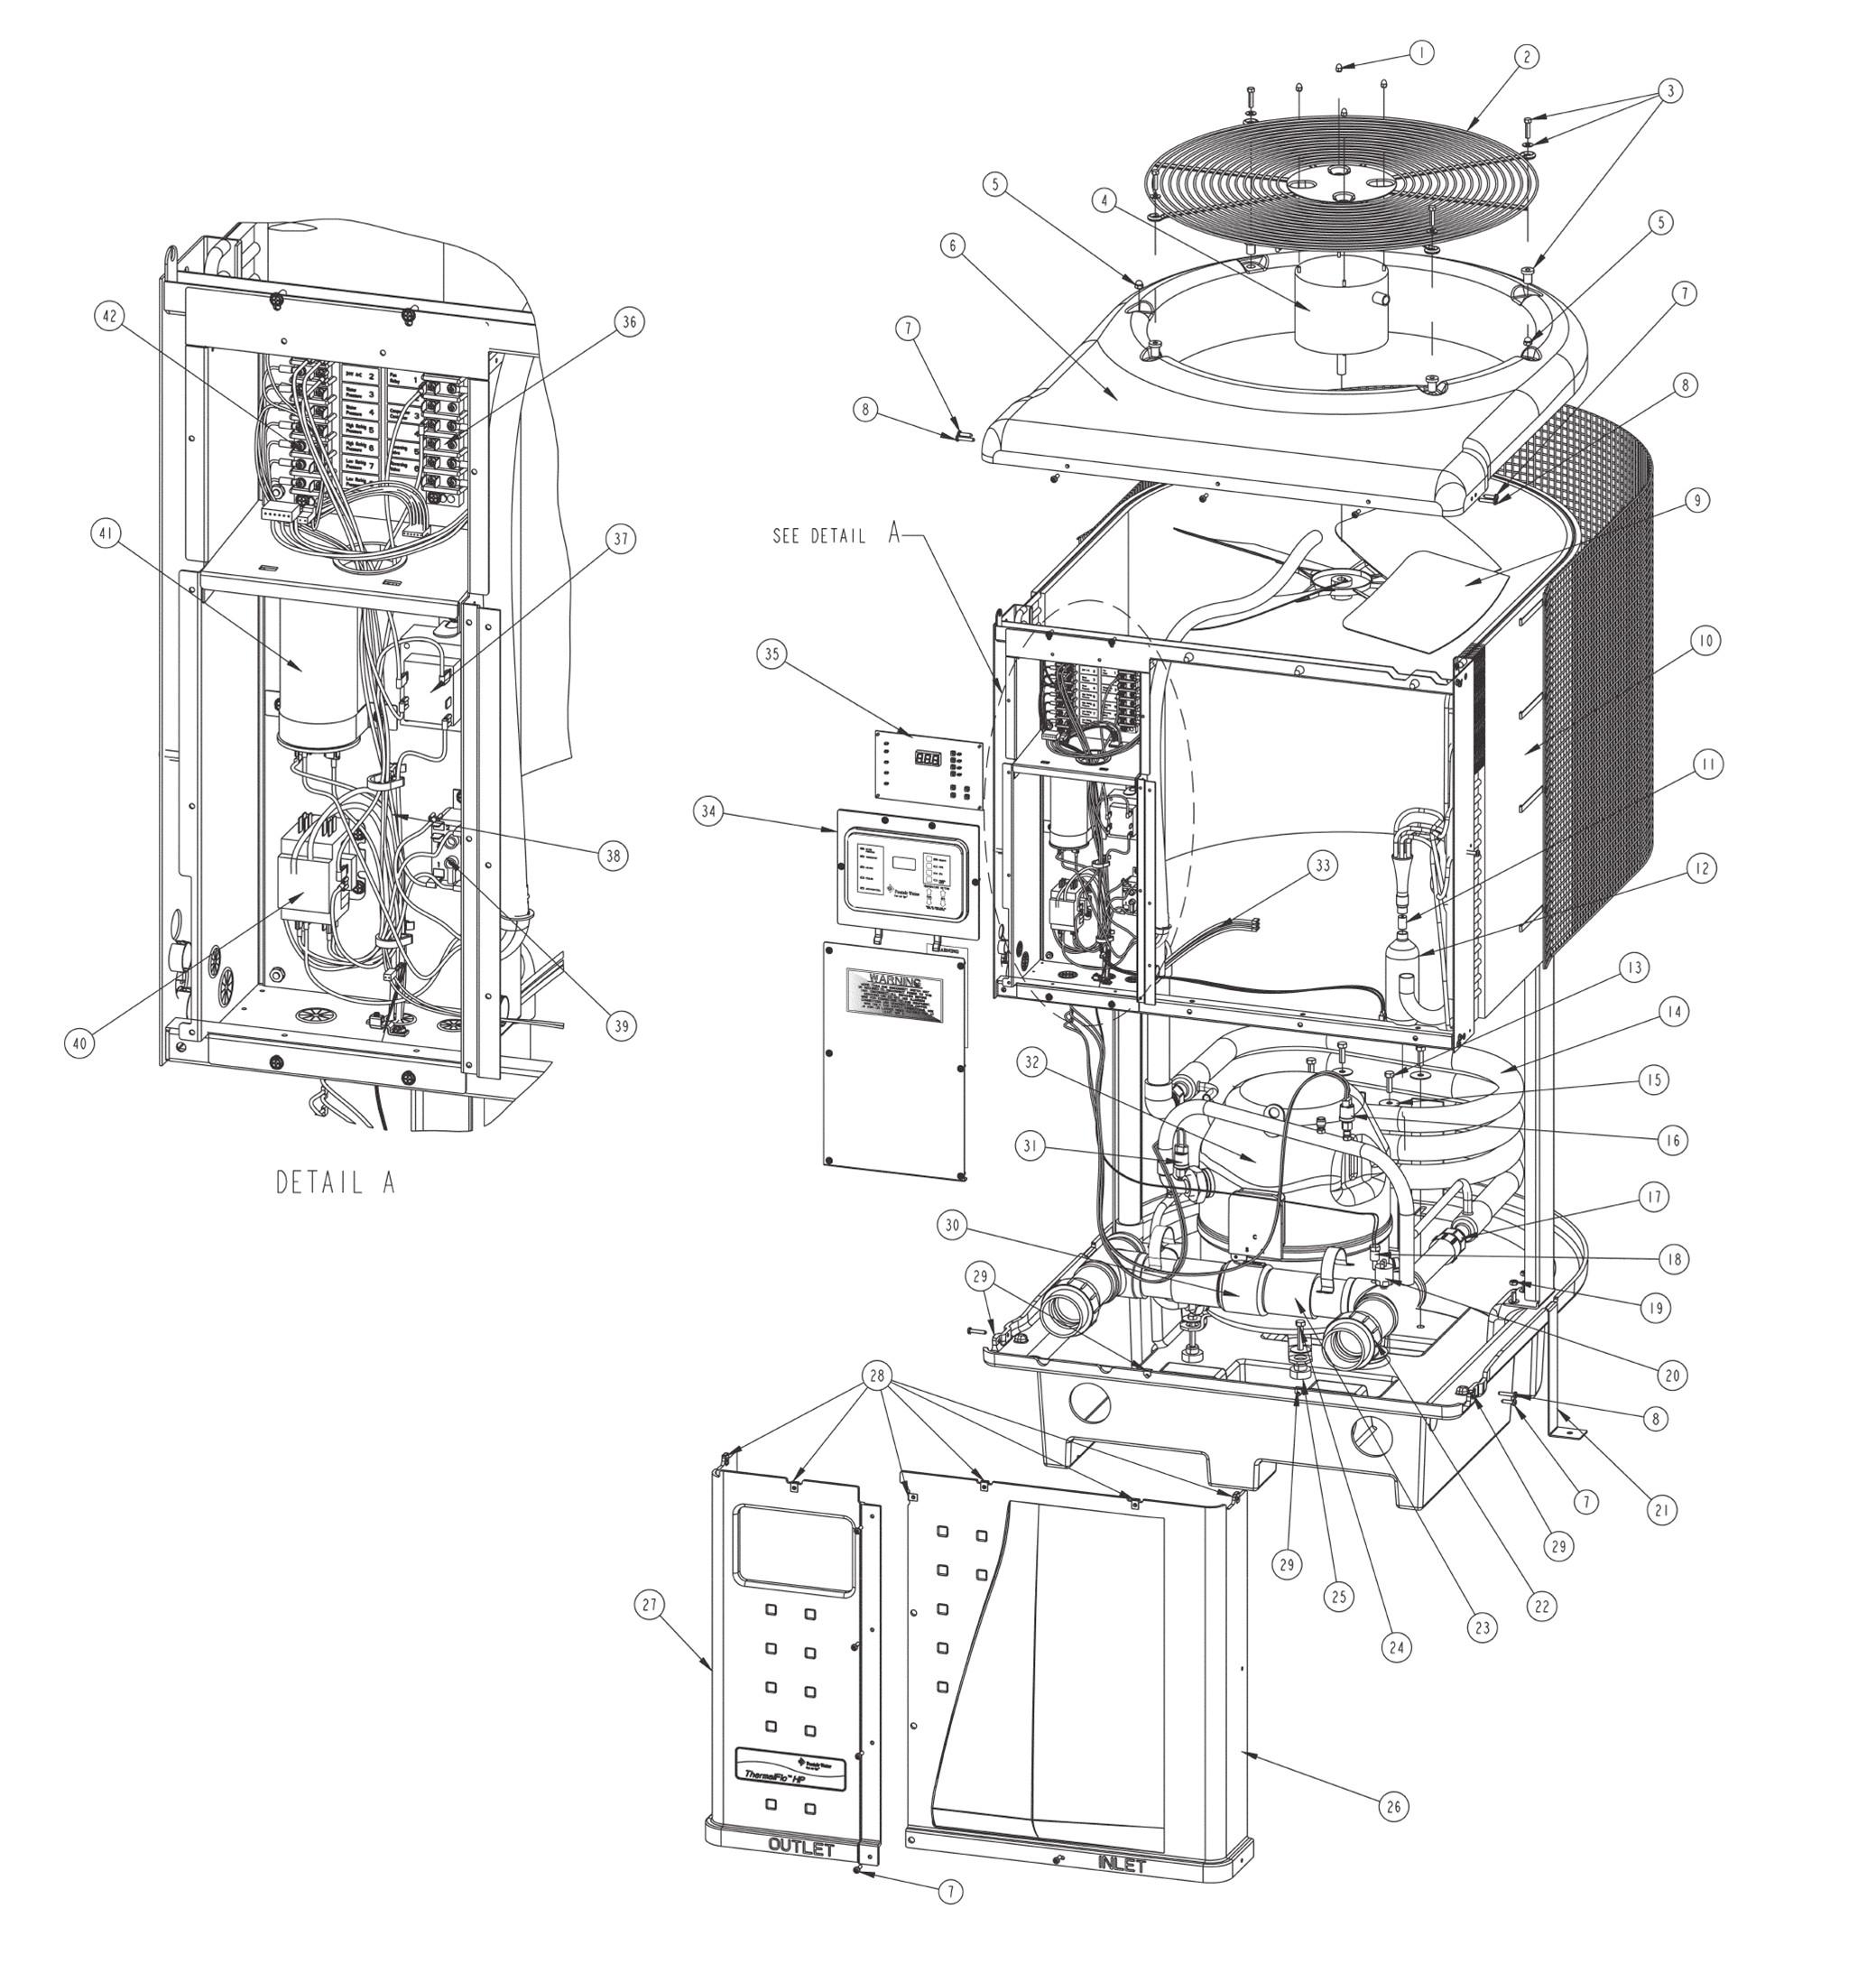 Hayward Super Pump Parts Diagram Pentair thermalflo™ Heat Pump Parts Of Hayward Super Pump Parts Diagram